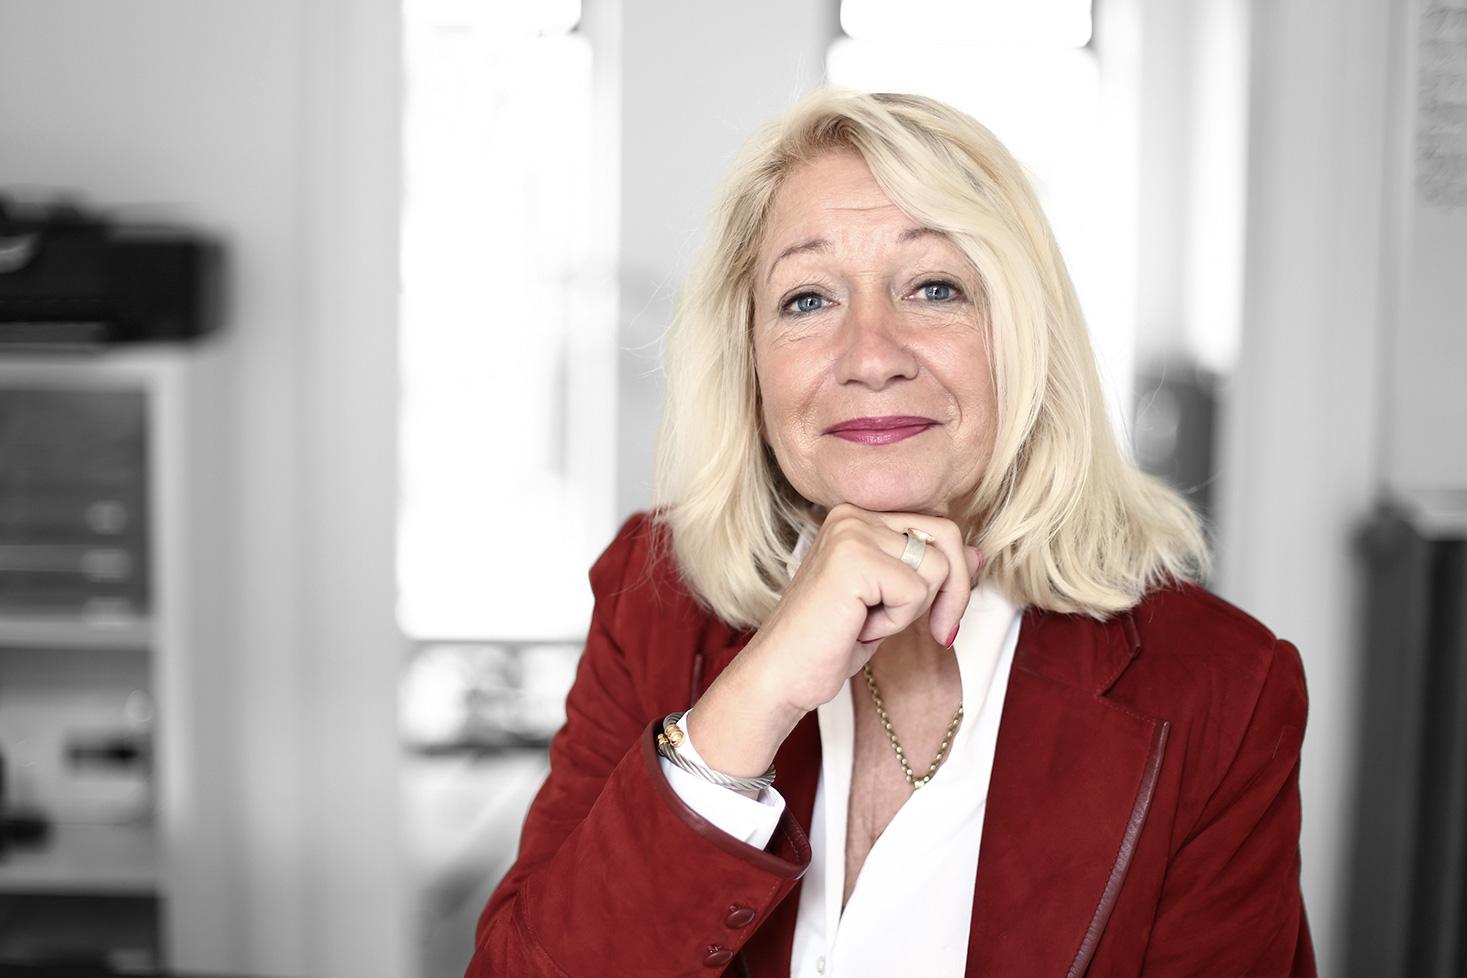 Ursula Neuhaus